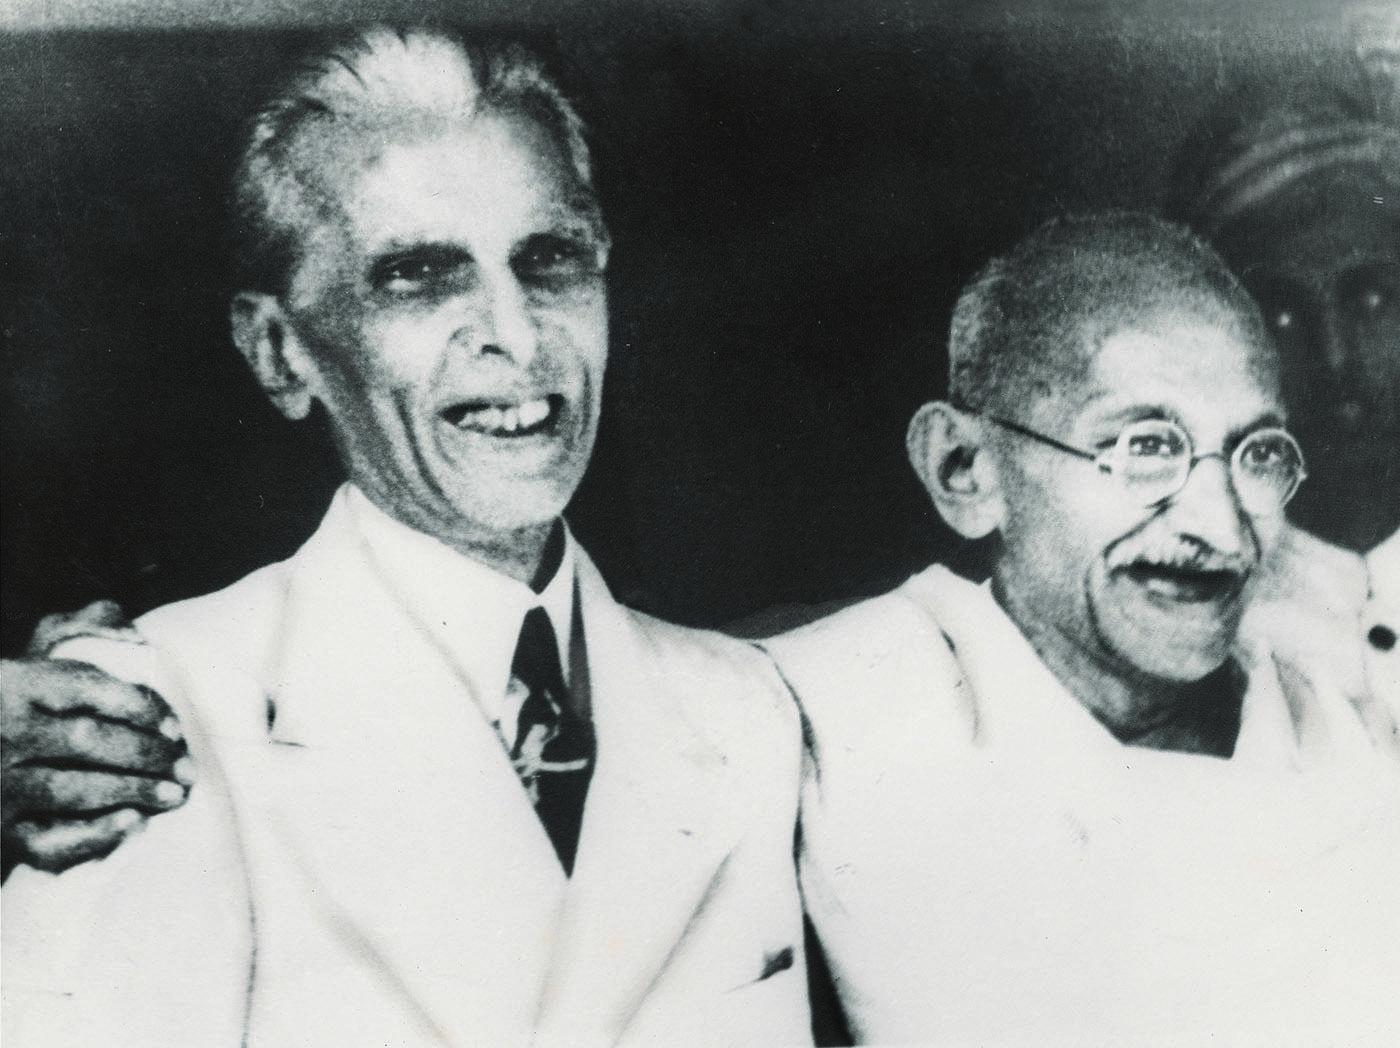 The Quaid-i-Azam, Mohammad Ali Jinnah and Mahatma Gandhi smile during the Jinnah-Gandhi talks. — Courtesy National Archives Islamabad